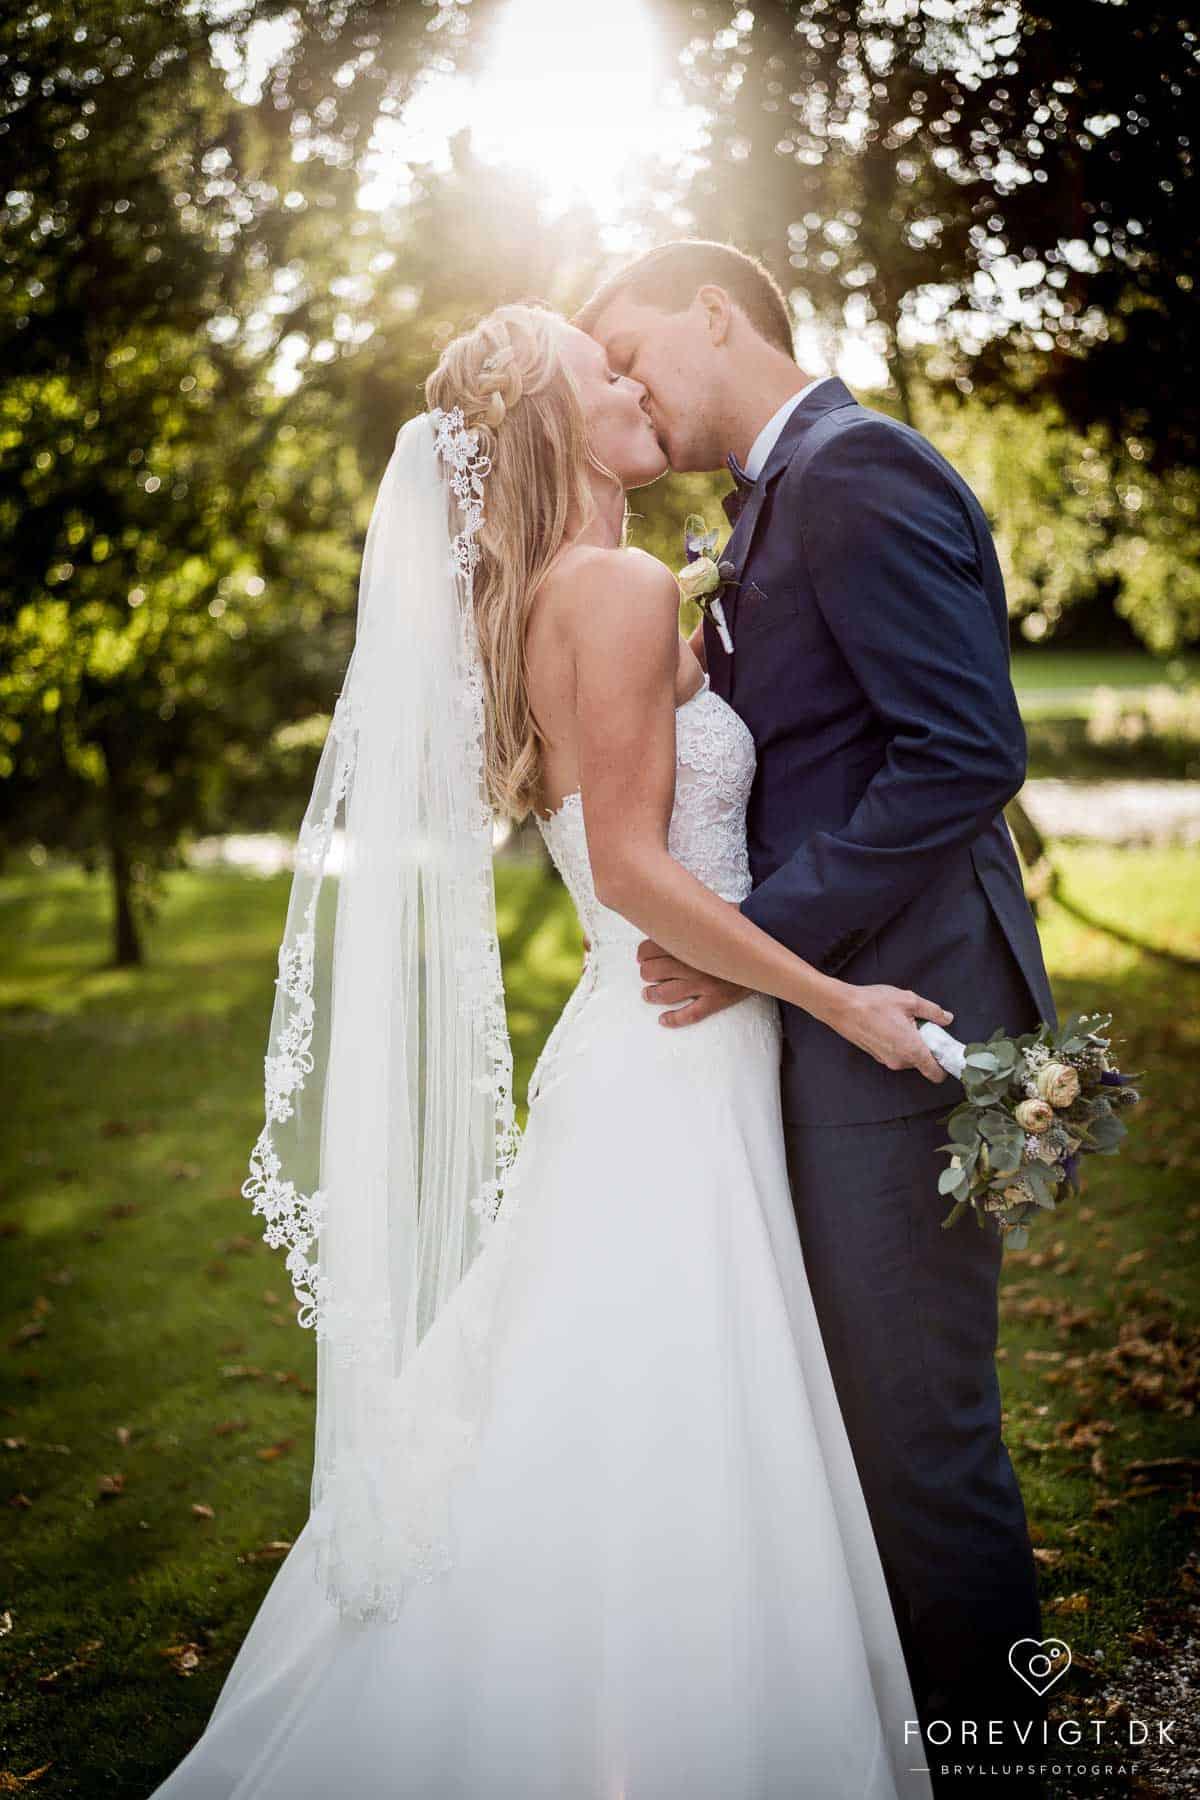 Bryllupsfotograf Nibe - fotografer, bryllupsbilleder, bryllupsfotografer